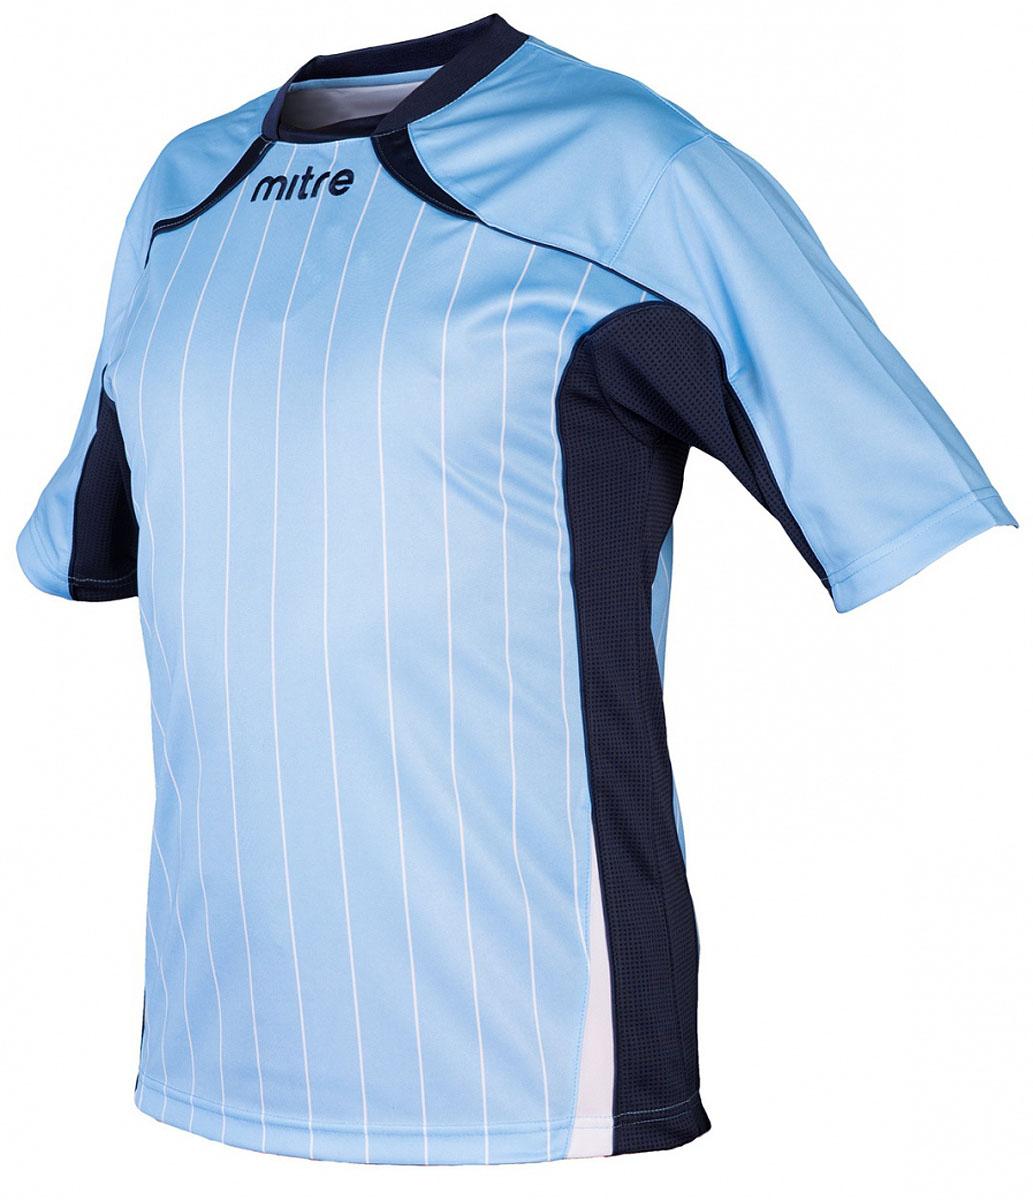 Футболка мужская Mitre, цвет: голубой. 5T40051MSKN. Размер S (46/48) футболка мужская mitre цвет желтый tt29019 размер xxl 54 56